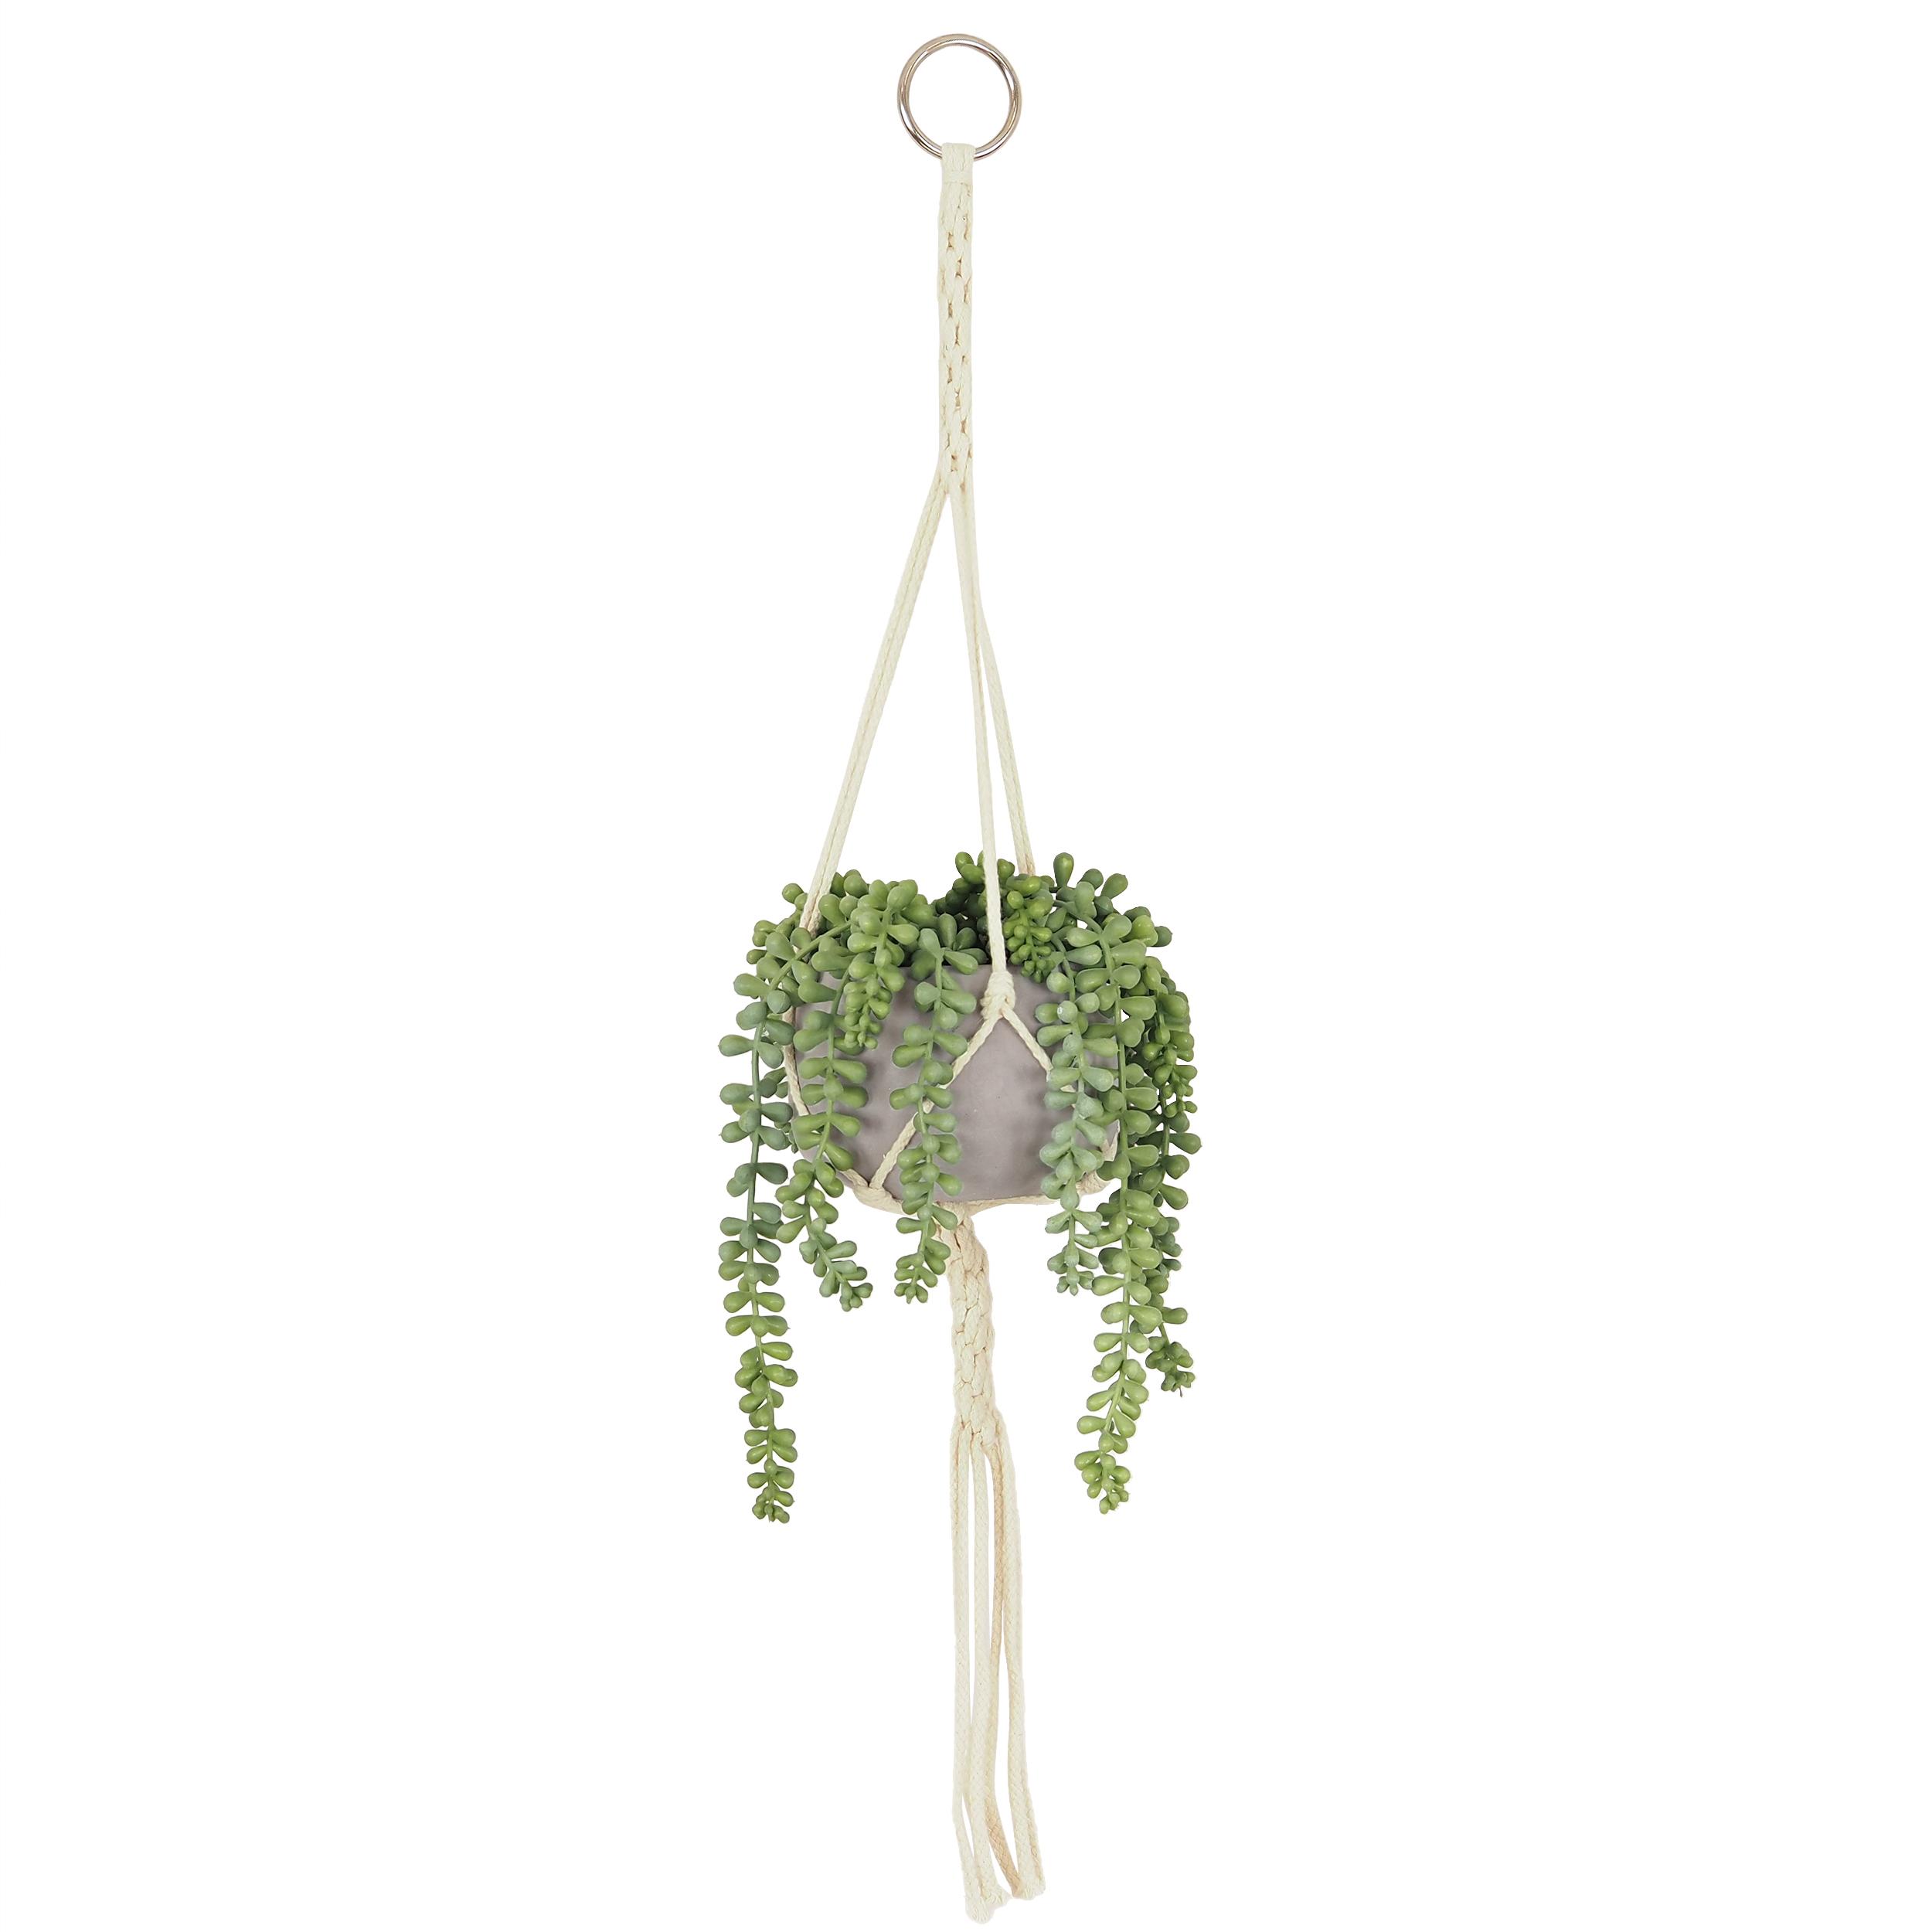 Suspension Succulentes artificielles 70 cm